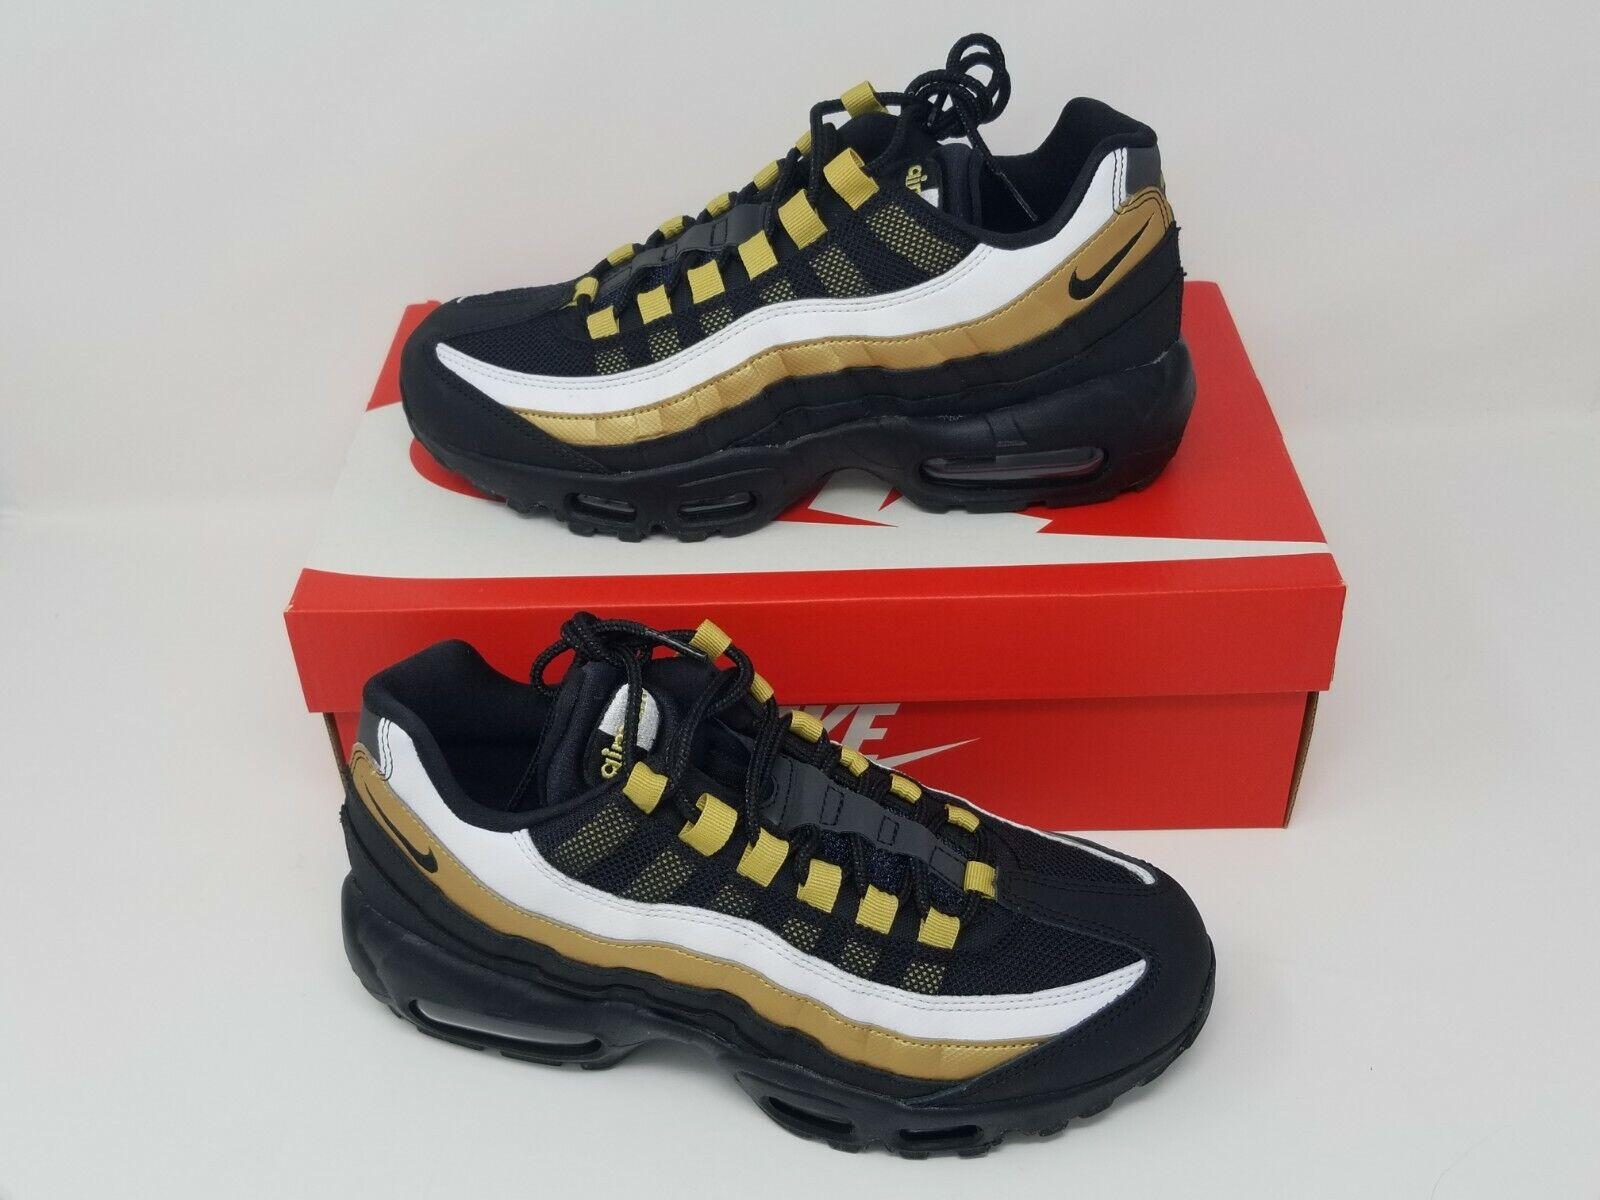 Nike Air Max 95 OG Black & gold AT2865-002 - New With Box